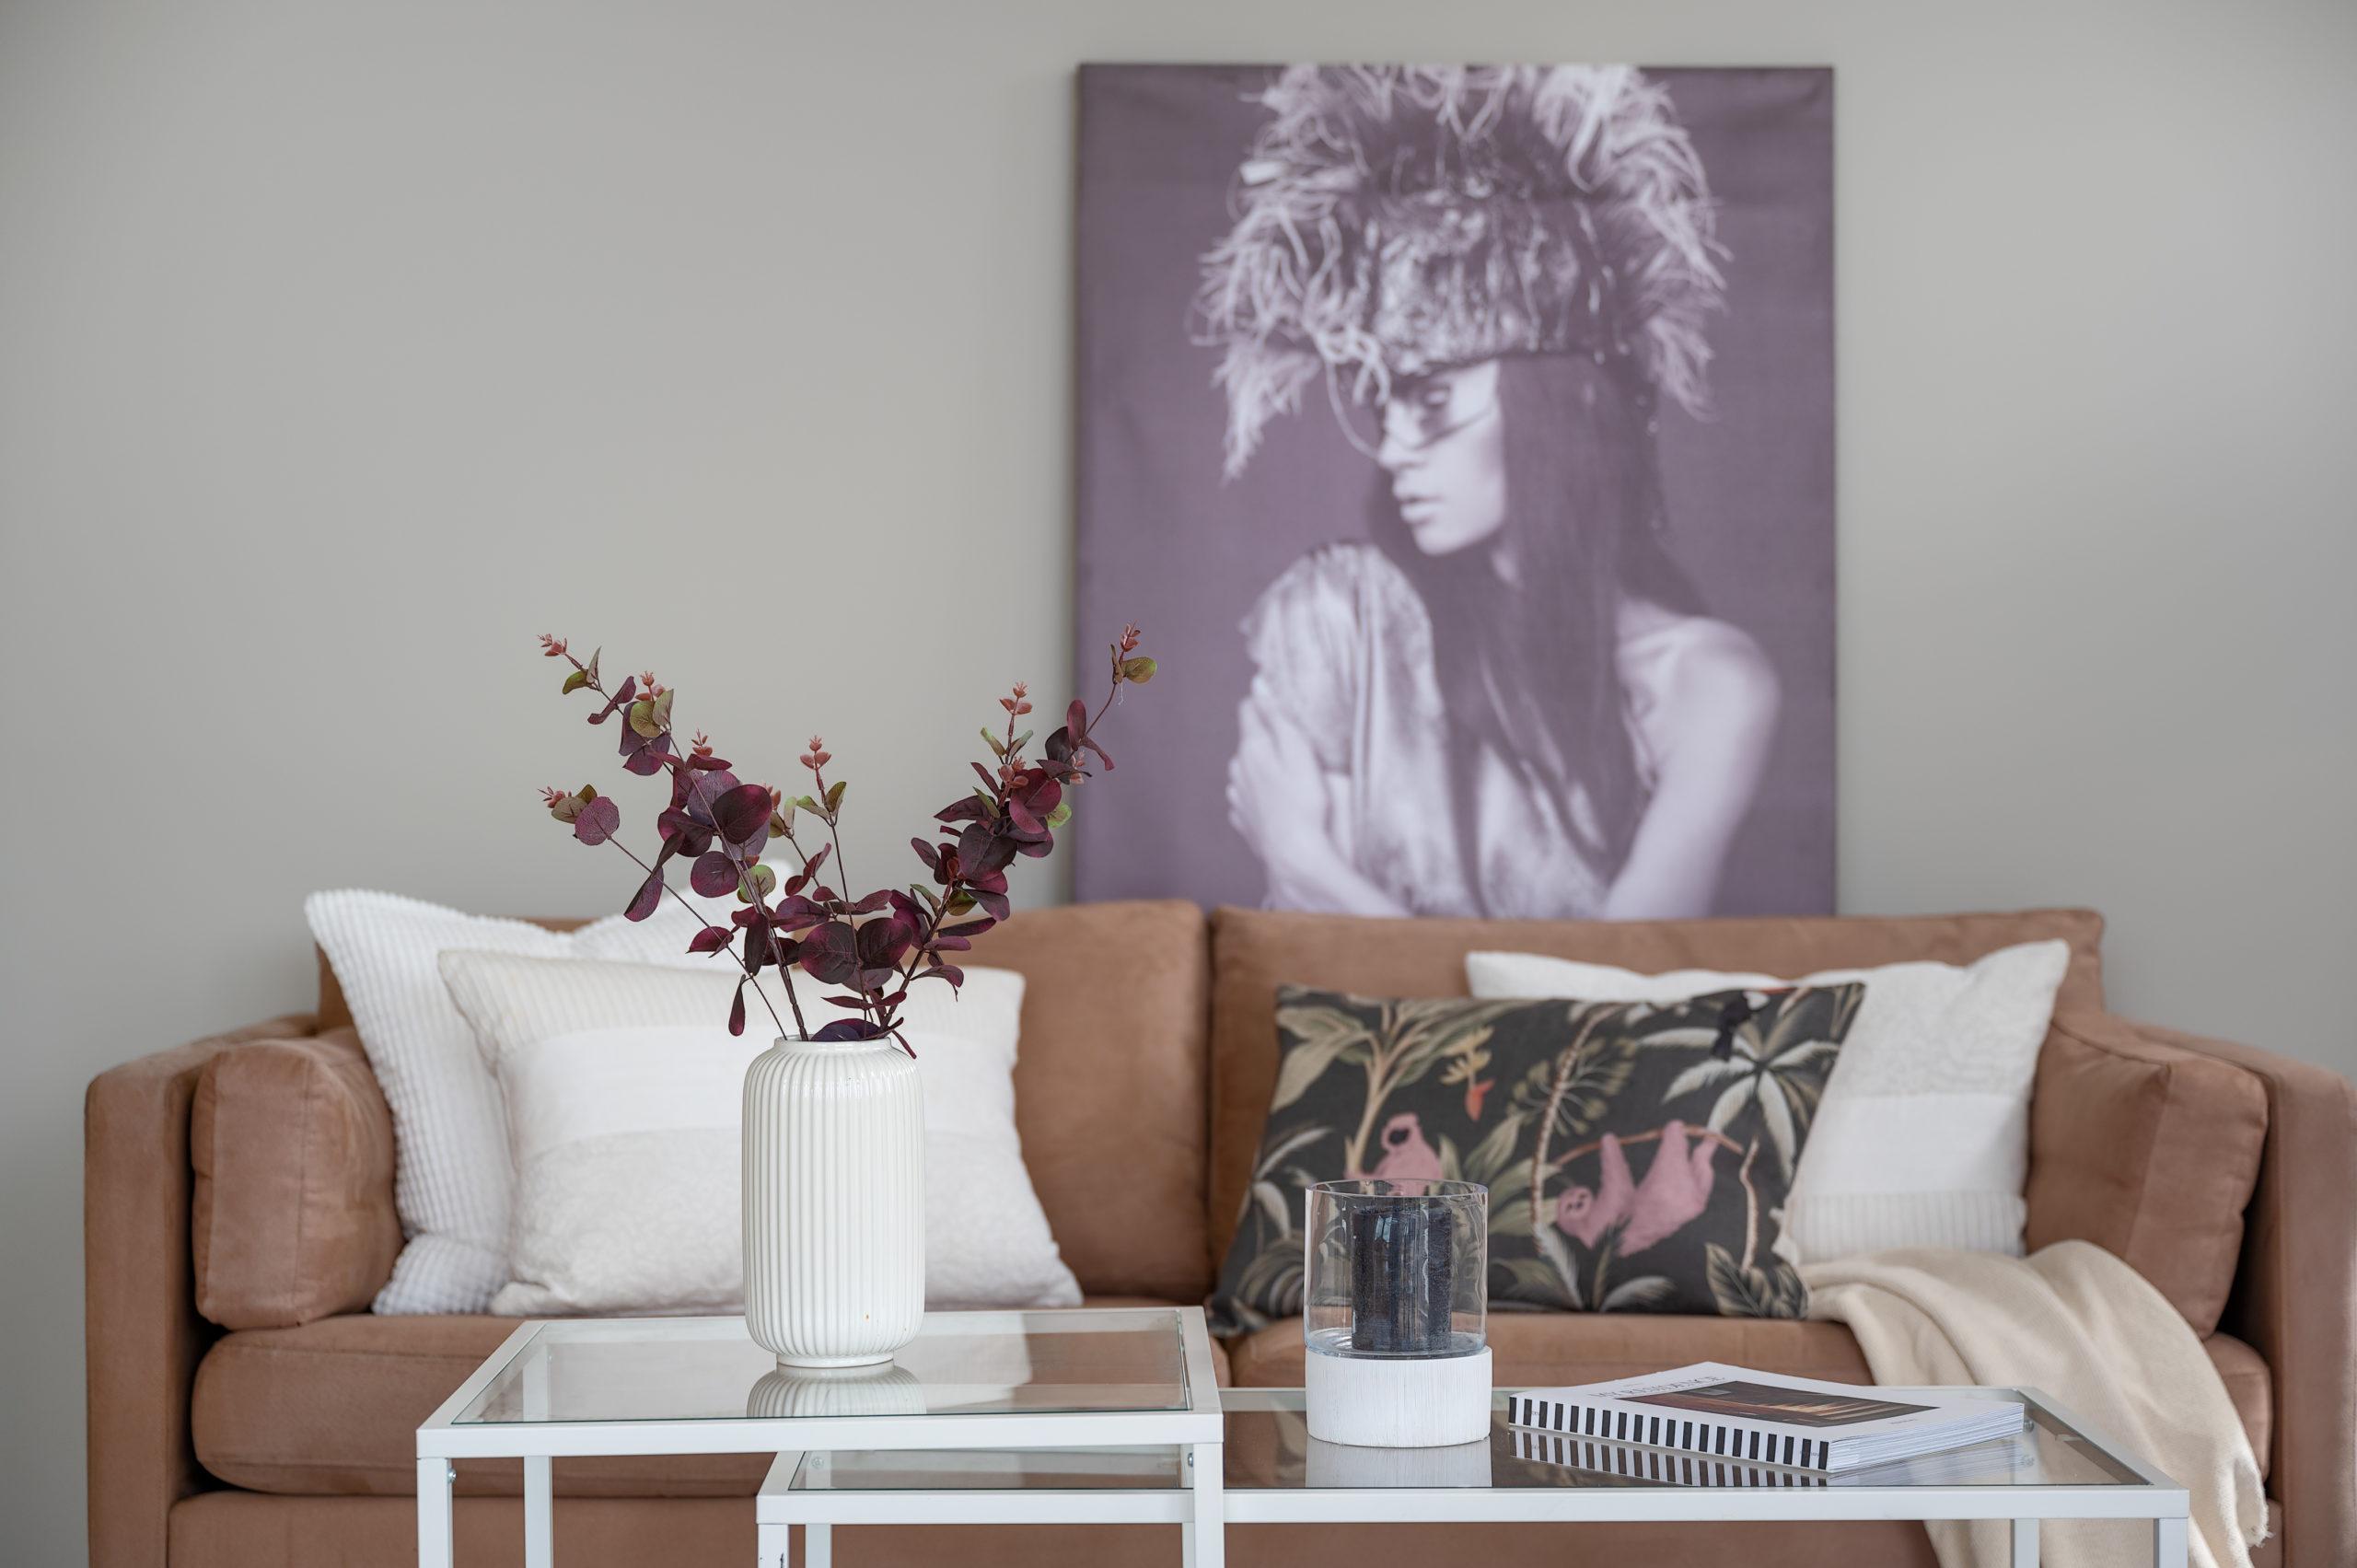 Enebolig Fjellfoten Hage: Moderne interiørdetaljer